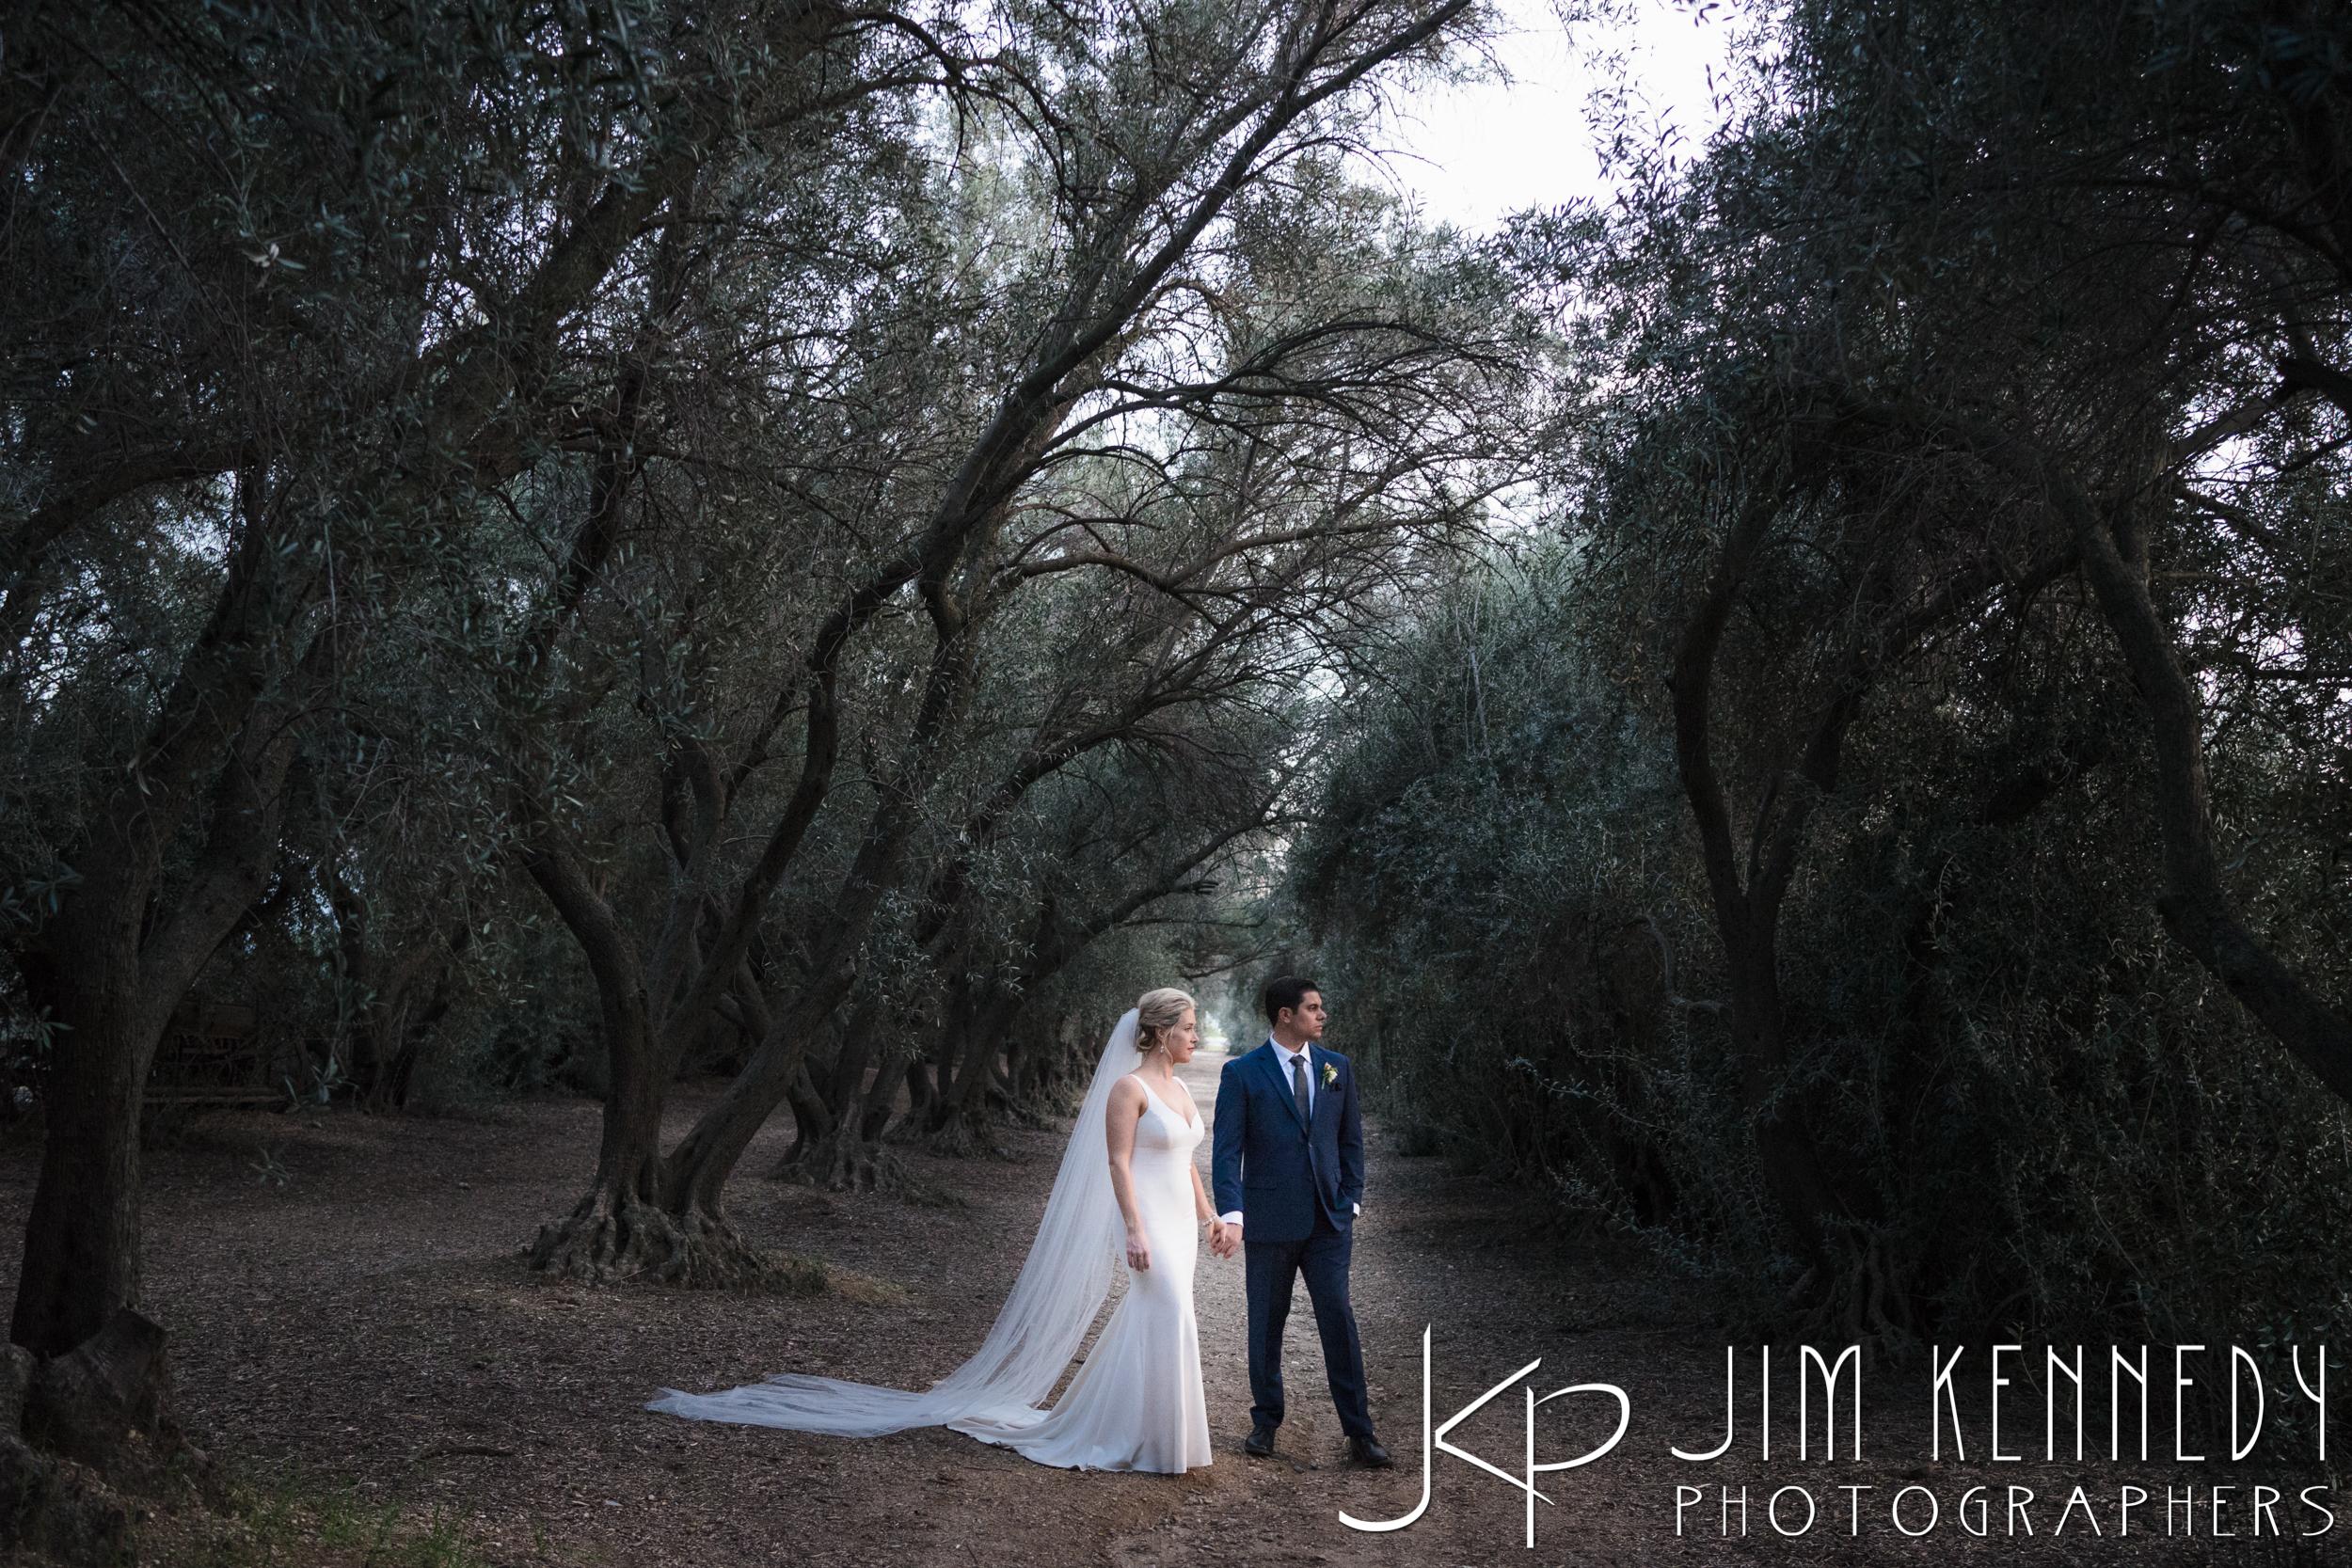 jim_kennedy_photographers_highland_springs_wedding_caitlyn_0154.jpg